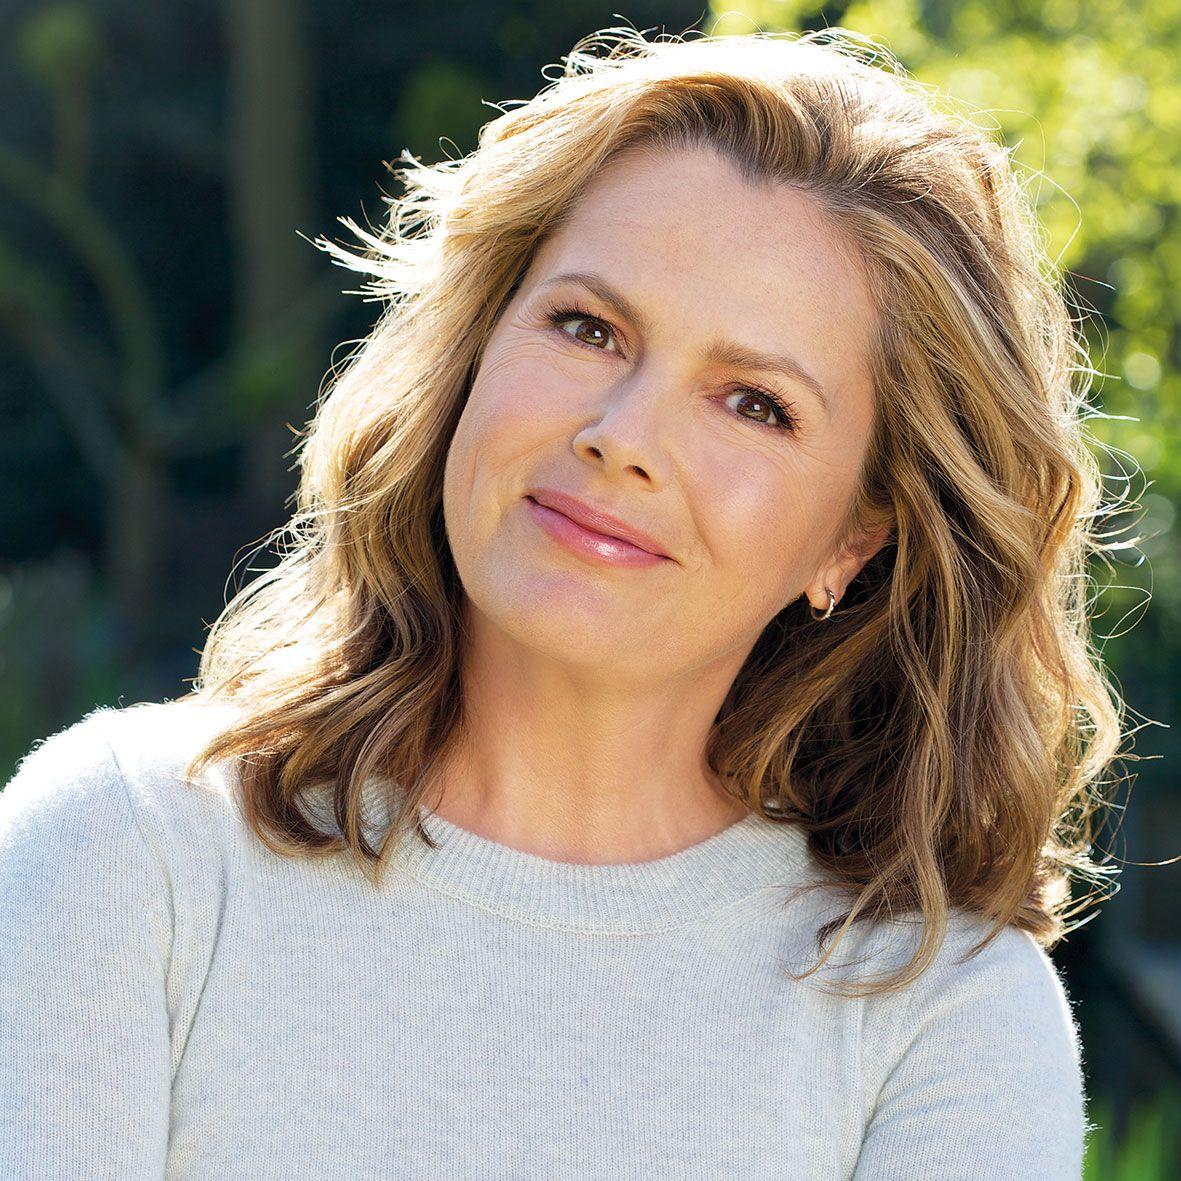 Liz Earle Reveals Her Skincare Regime